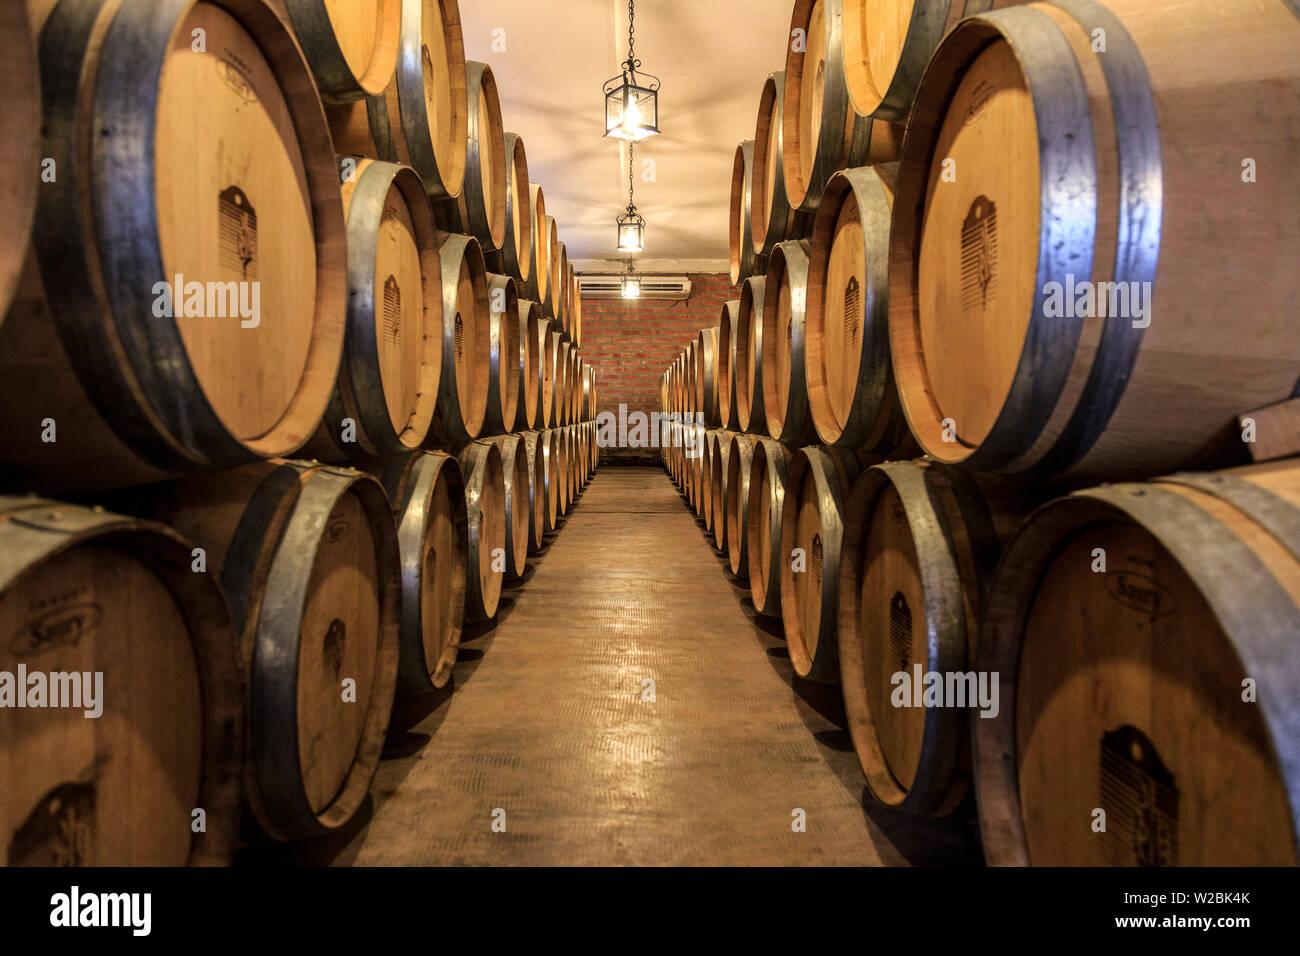 Argentina, Salta, Cafayate, Bodega San Pedro de Yacoyuya, Torrontes Grape Wineries - Stock Image